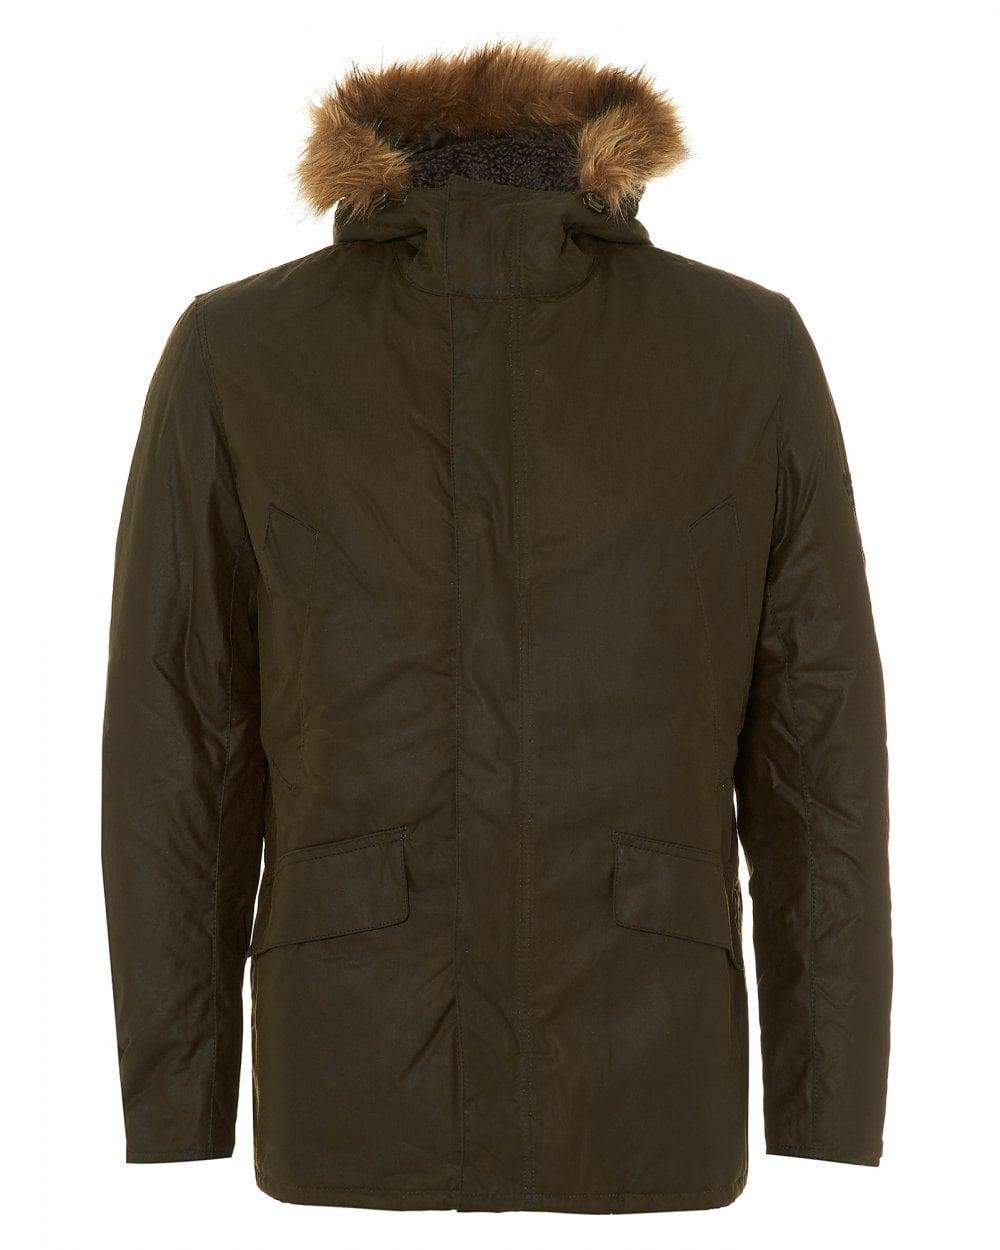 Barbour International Mens Sub Waxed Cotton Archive Olive Parka Jacket 97ca1832198e